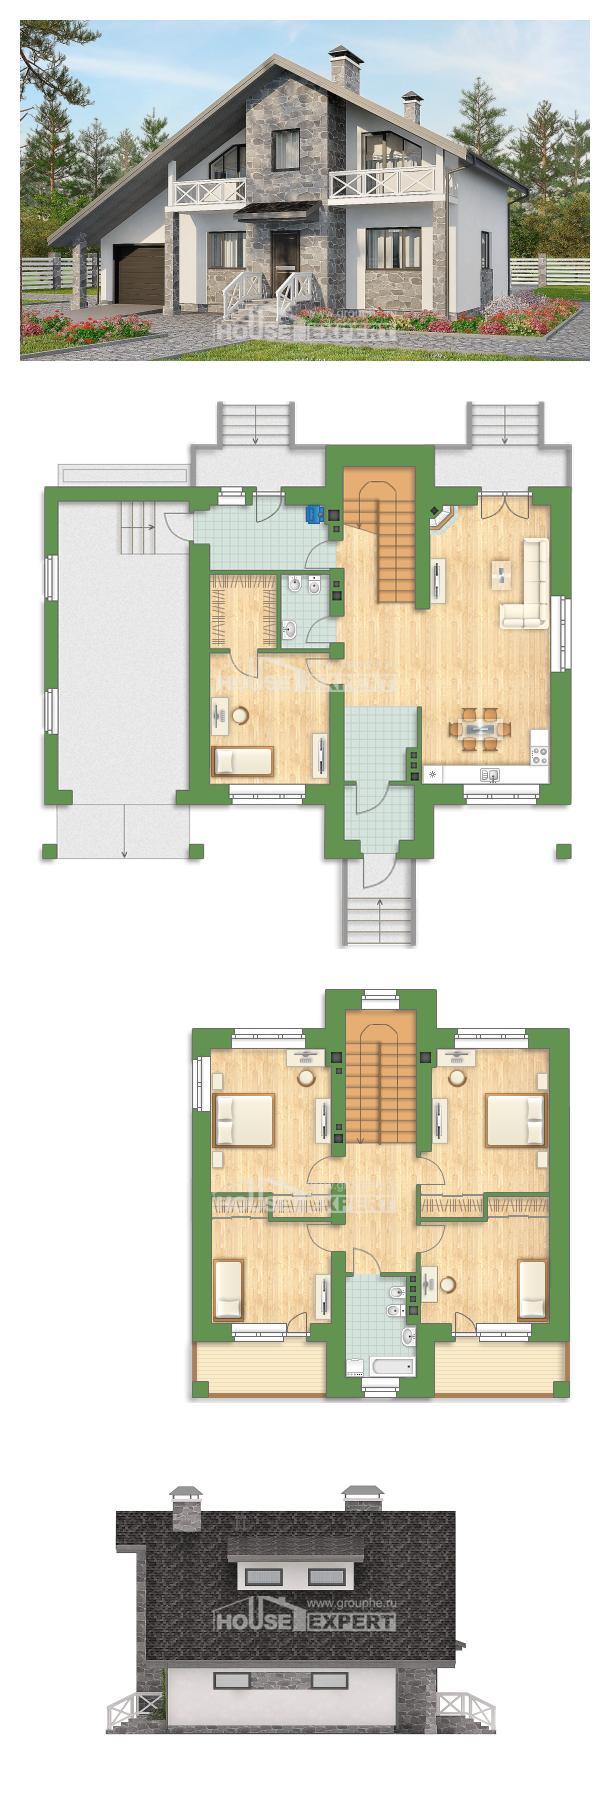 Proyecto de casa 180-017-L | House Expert